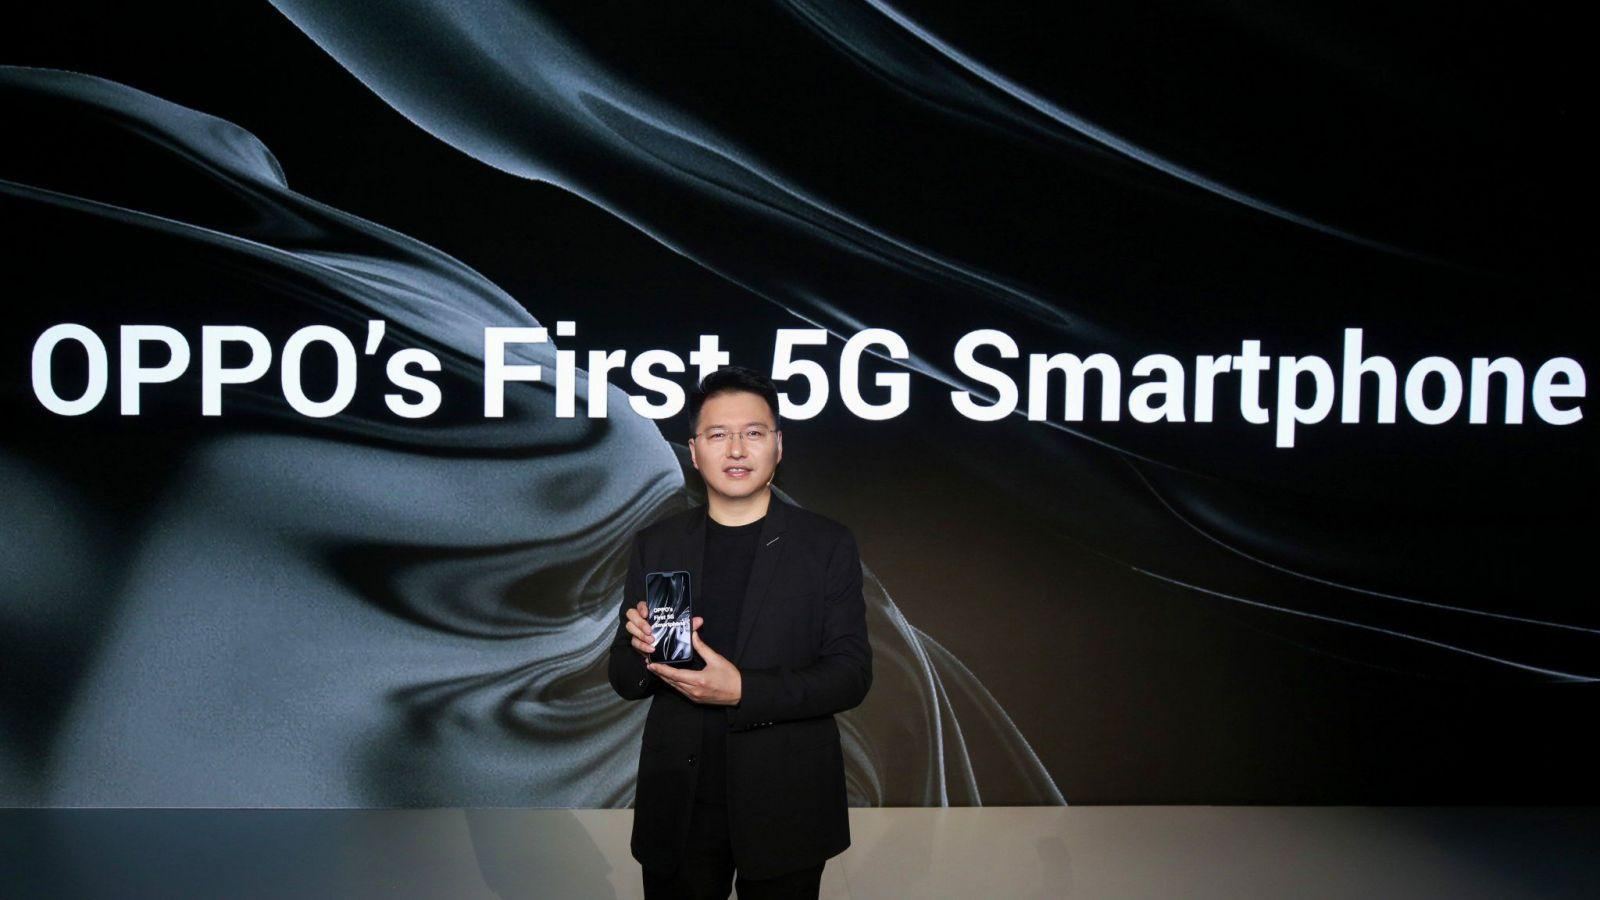 d0f_fqkxcamx8mh MWC 2019. Oppo представила свой первый 5G-смартфон